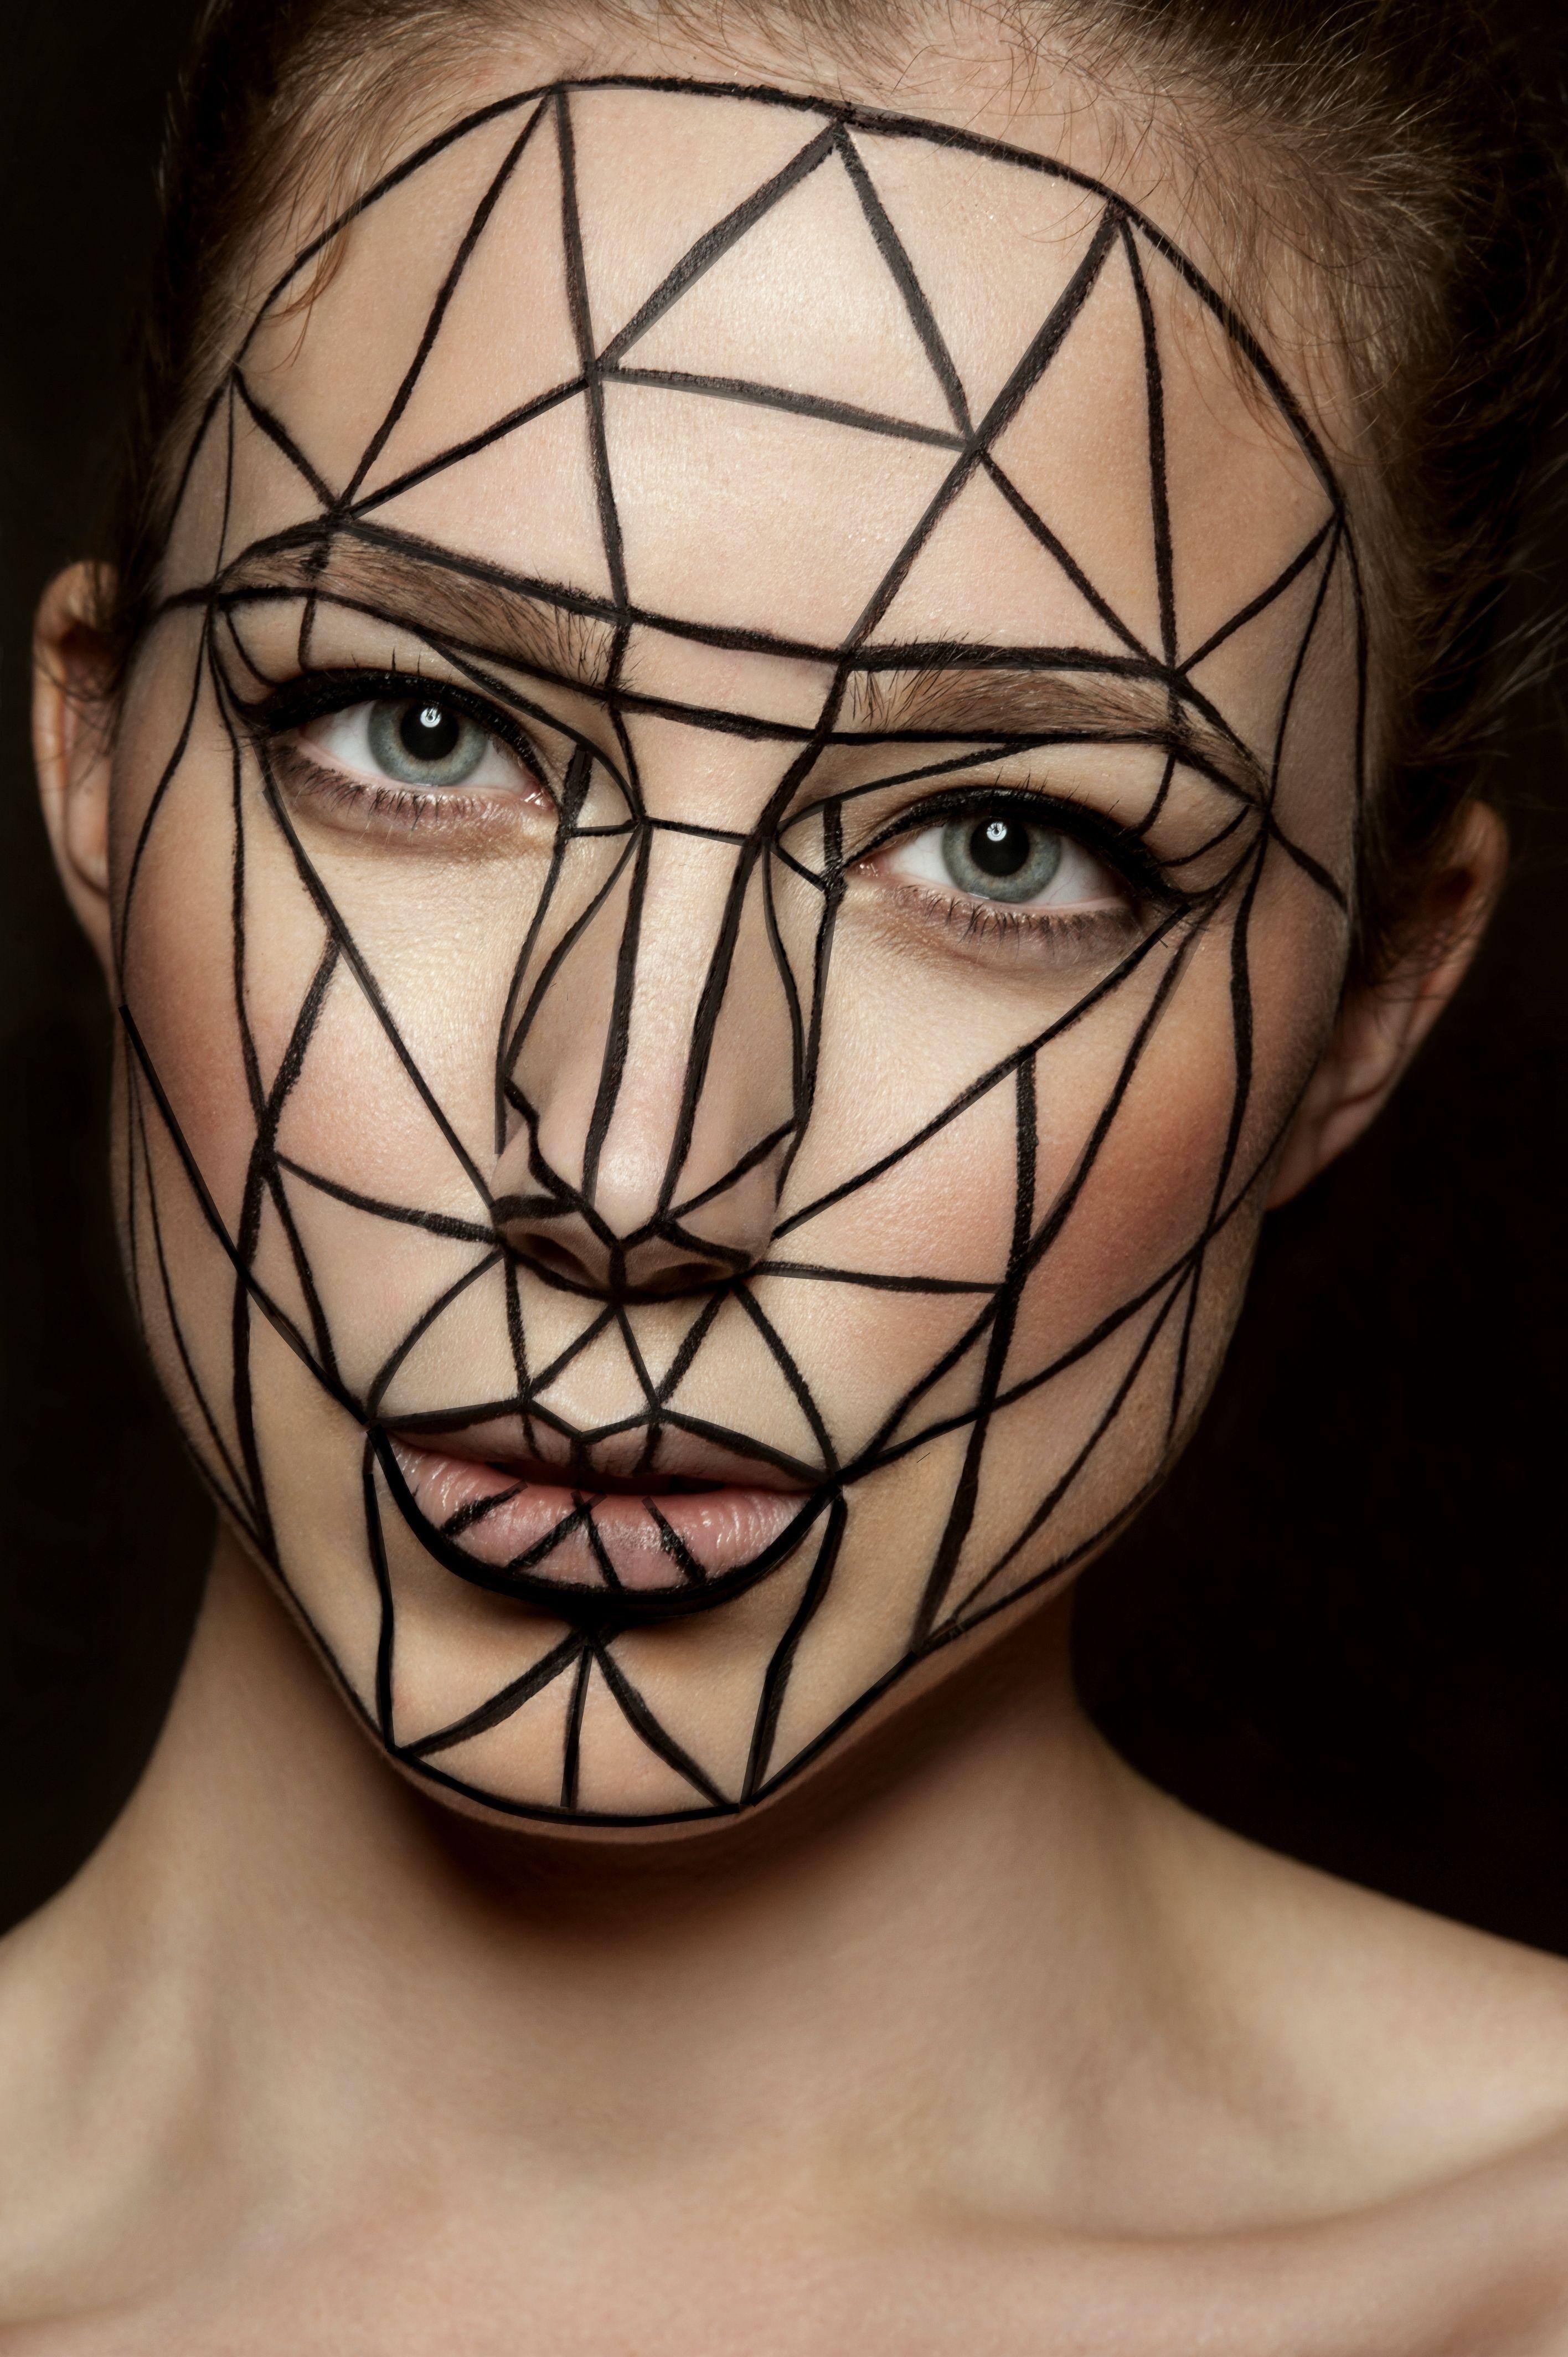 maquillage artistique diamant inspirations proportions du visage style l onard de vinci. Black Bedroom Furniture Sets. Home Design Ideas